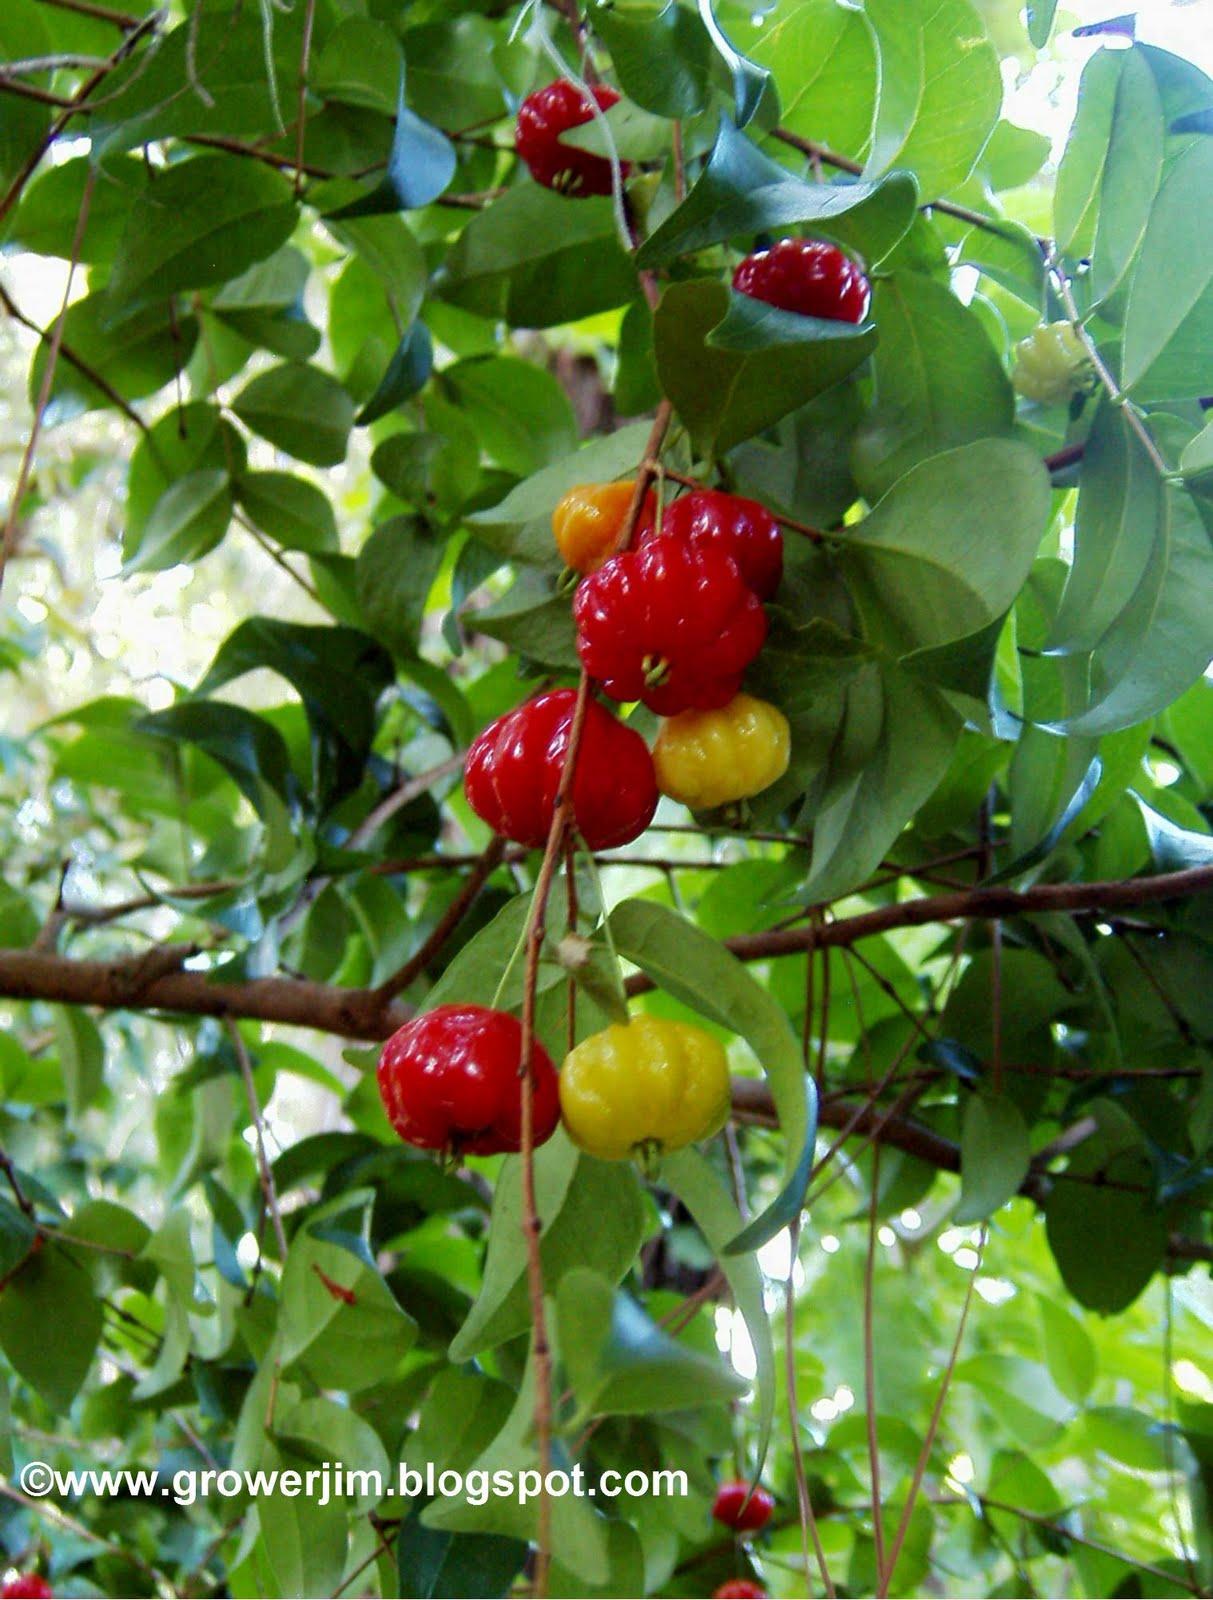 Surinam Cherry Eugenia Uniflora on Tropical Ornamental Trees